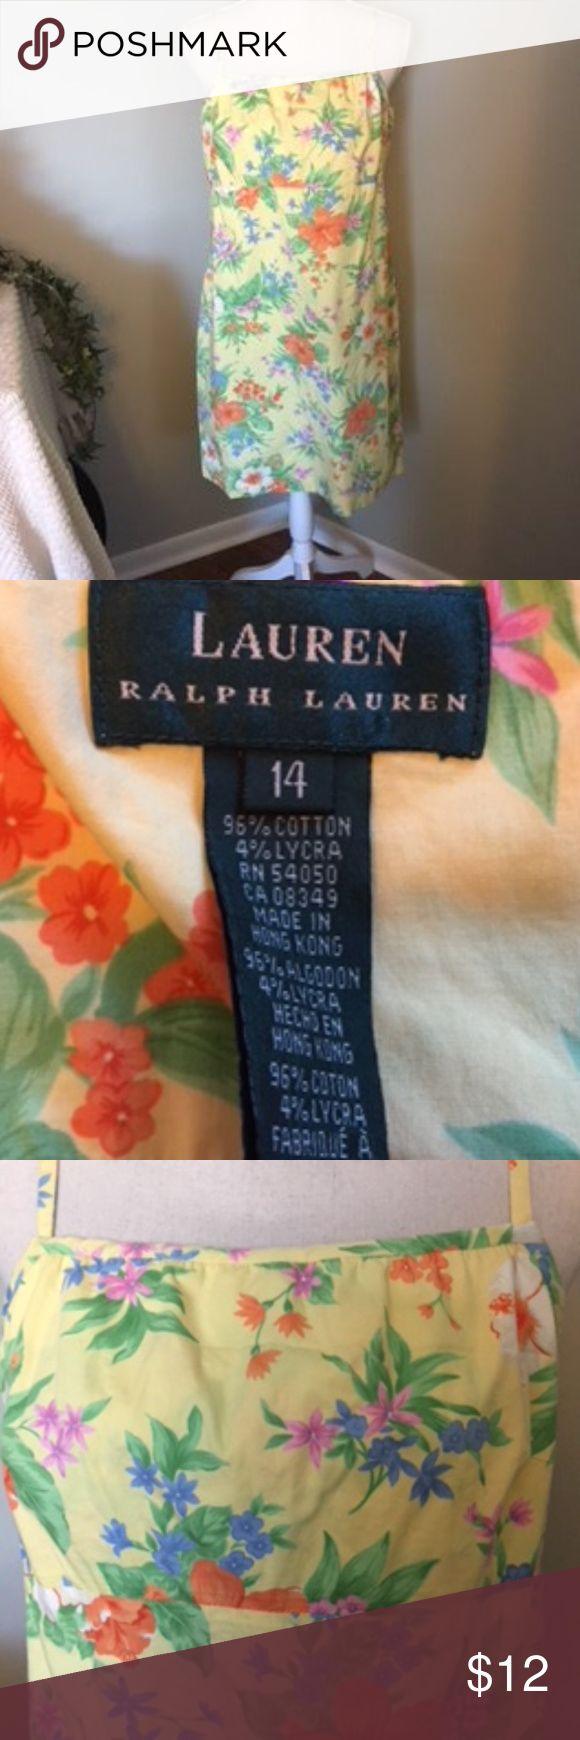 Lauren Ralph Lauren Dress Beautiful Ralph Lauren Dress Has Adjustable,  Straps Back Zipper,  Lined Bounce.  Fabric is Colorfully Done in Yellow, Orange, Green, (other)   Crisp but Soft Fabric in 96% Cotton 4% Lycra.  Size 14 Lauren Ralph Lauren Dresses